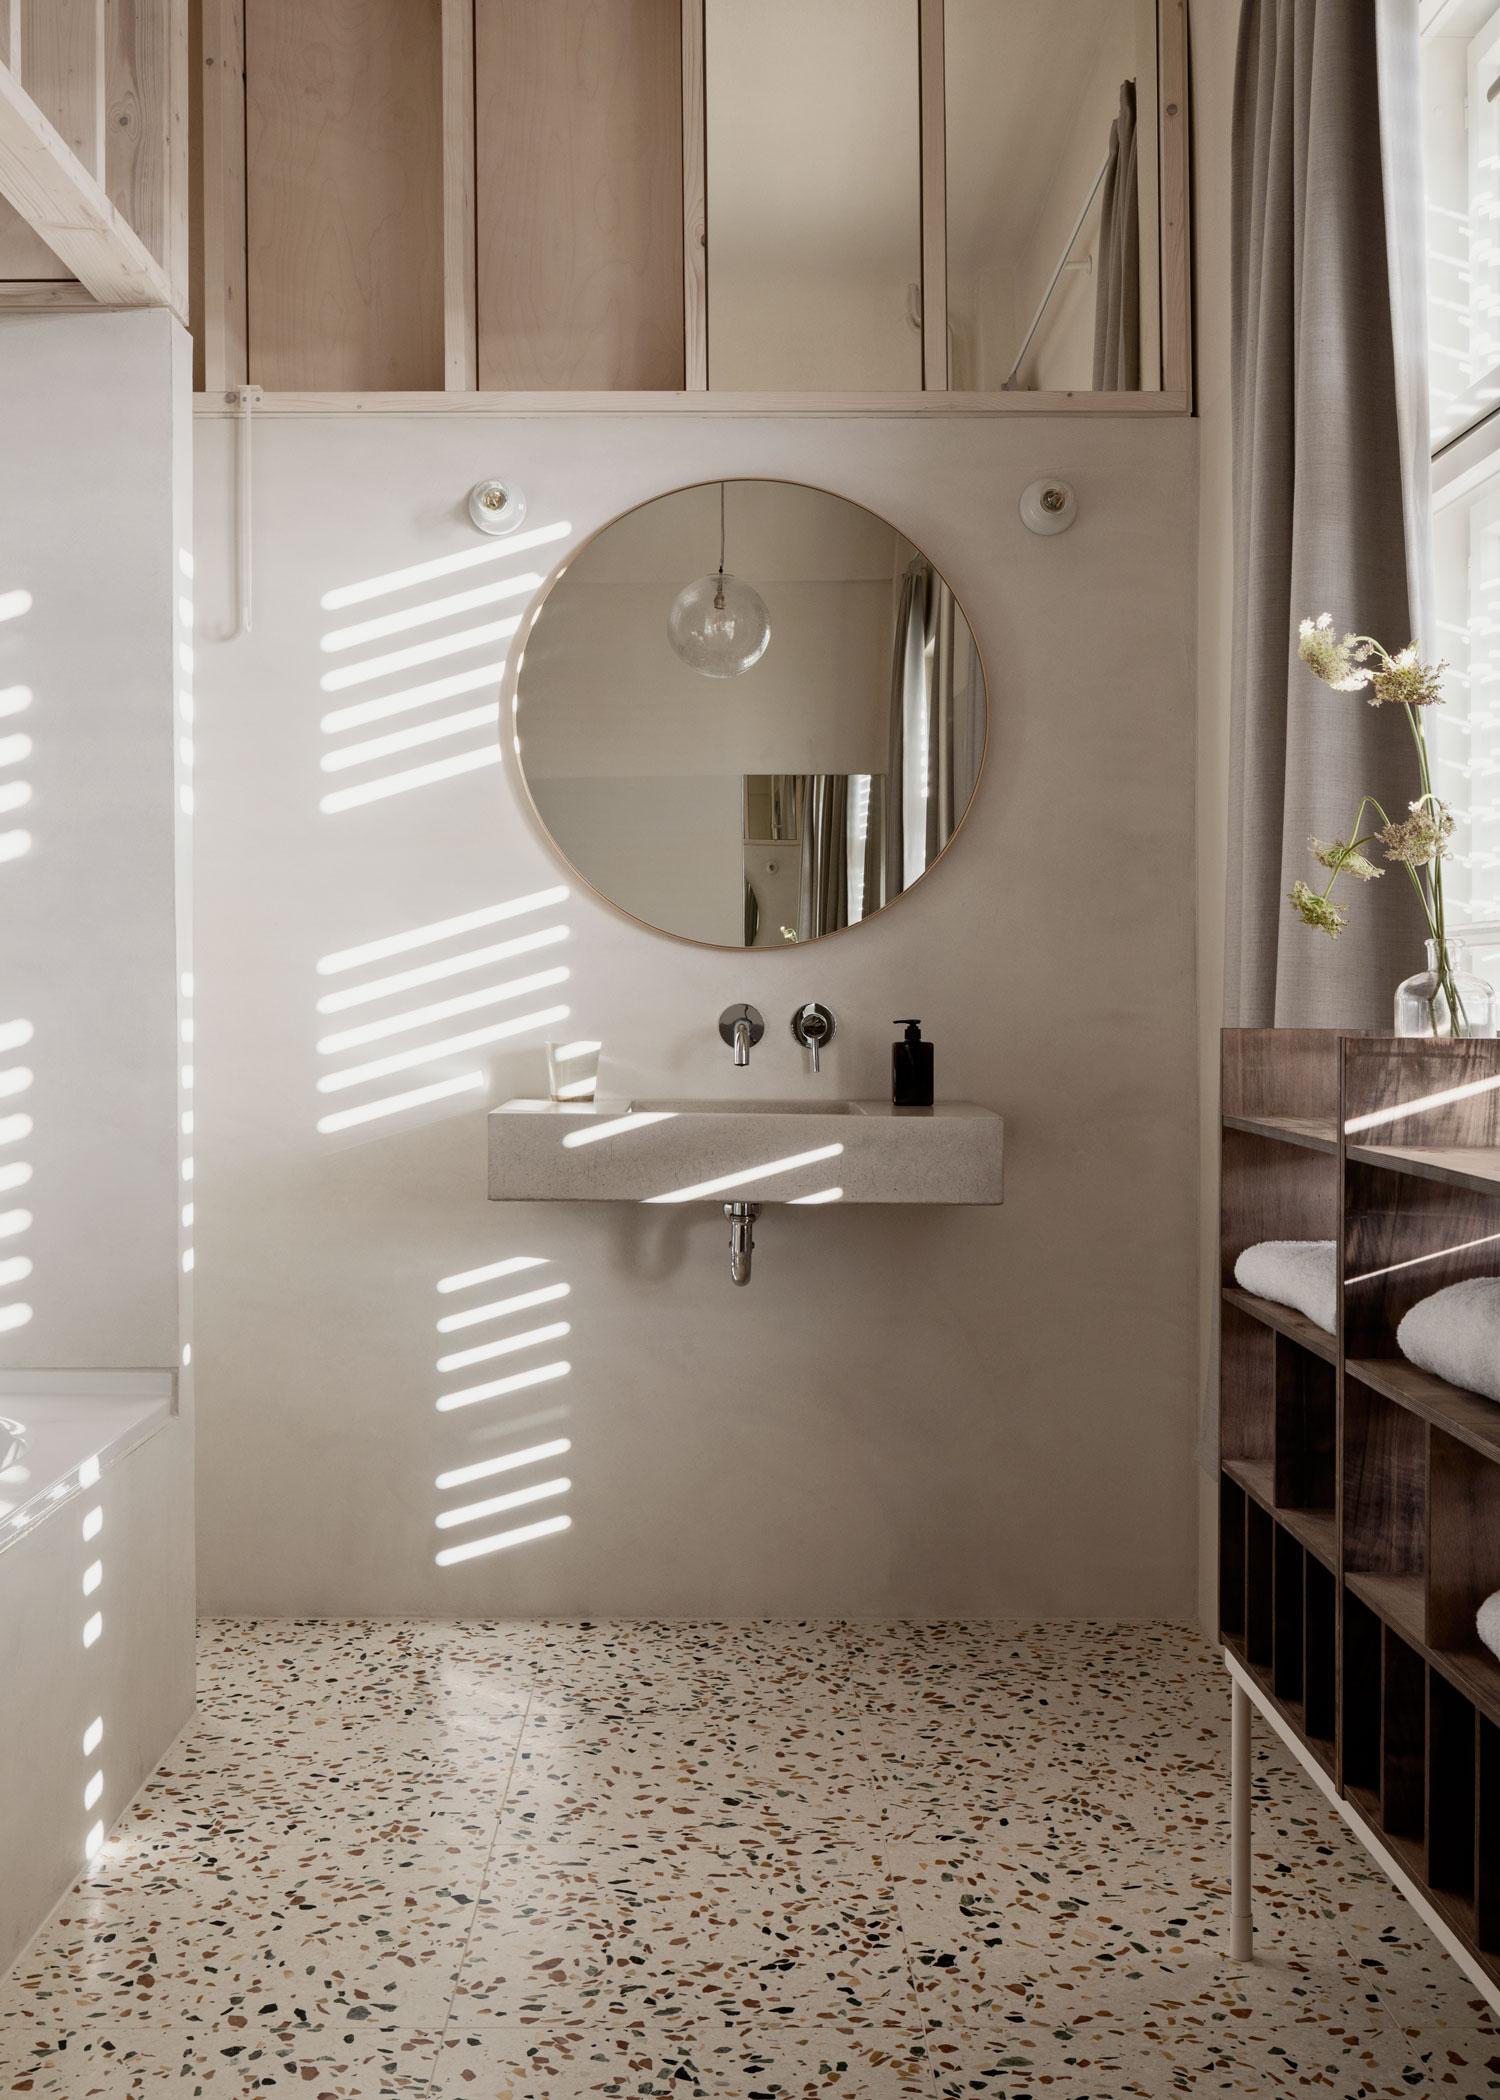 Michelberger Hotel Room Refurbishment in Berlin by Jonathan Tuckey Design.